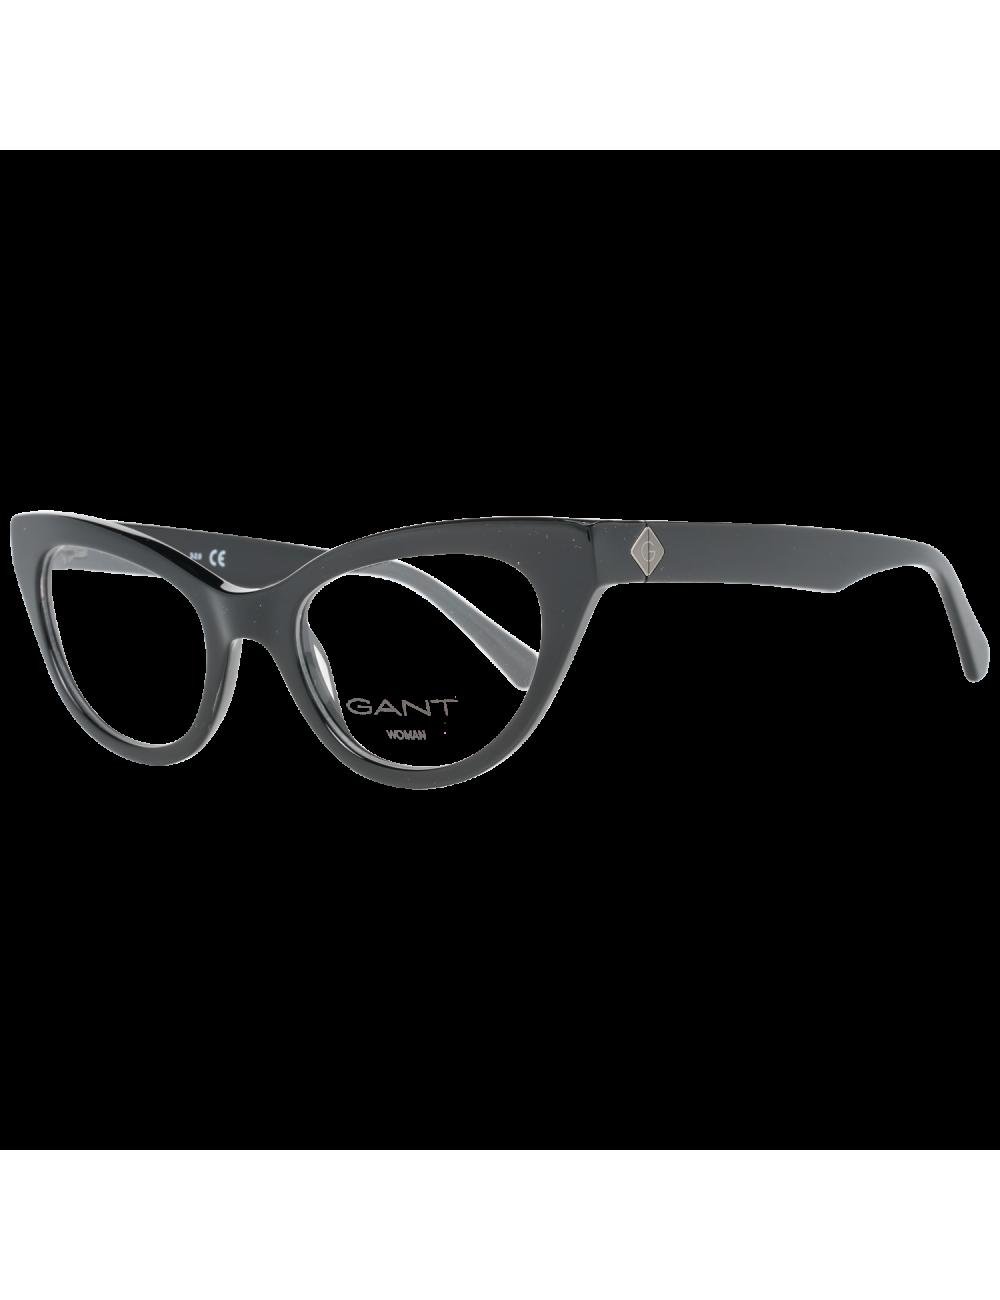 Gant Optical Frame GA4100 001 51